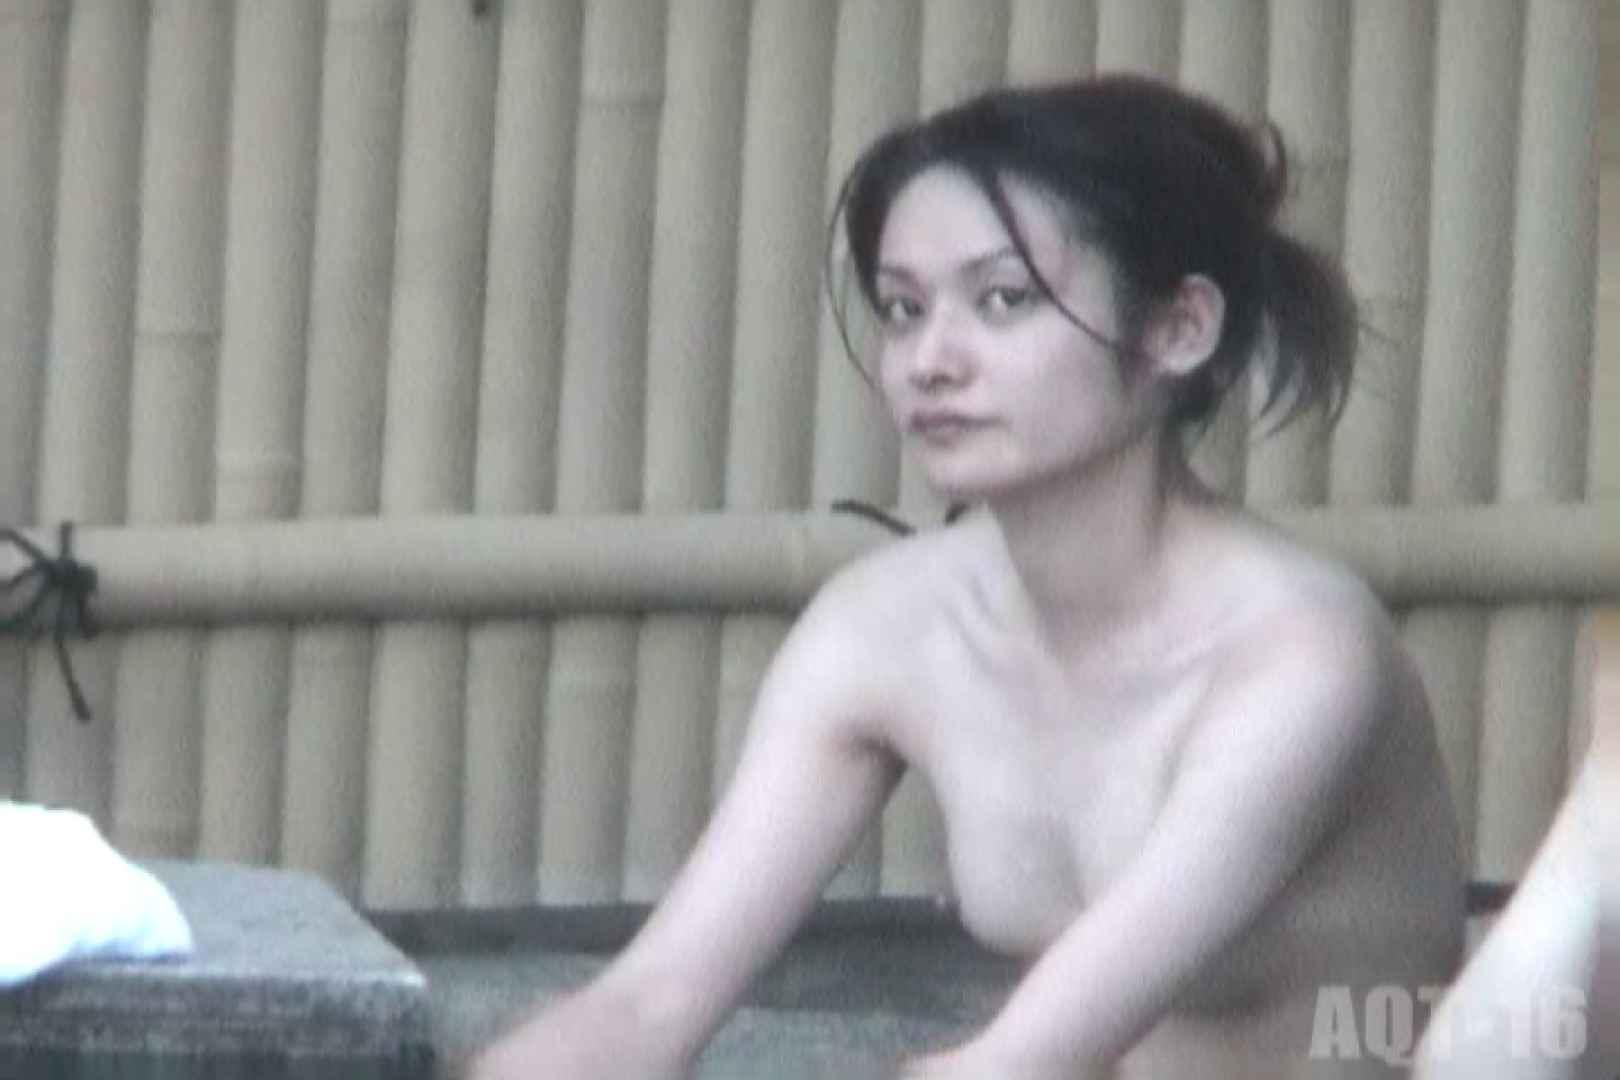 Aquaな露天風呂Vol.839 露天風呂突入 ワレメ動画紹介 96pic 74